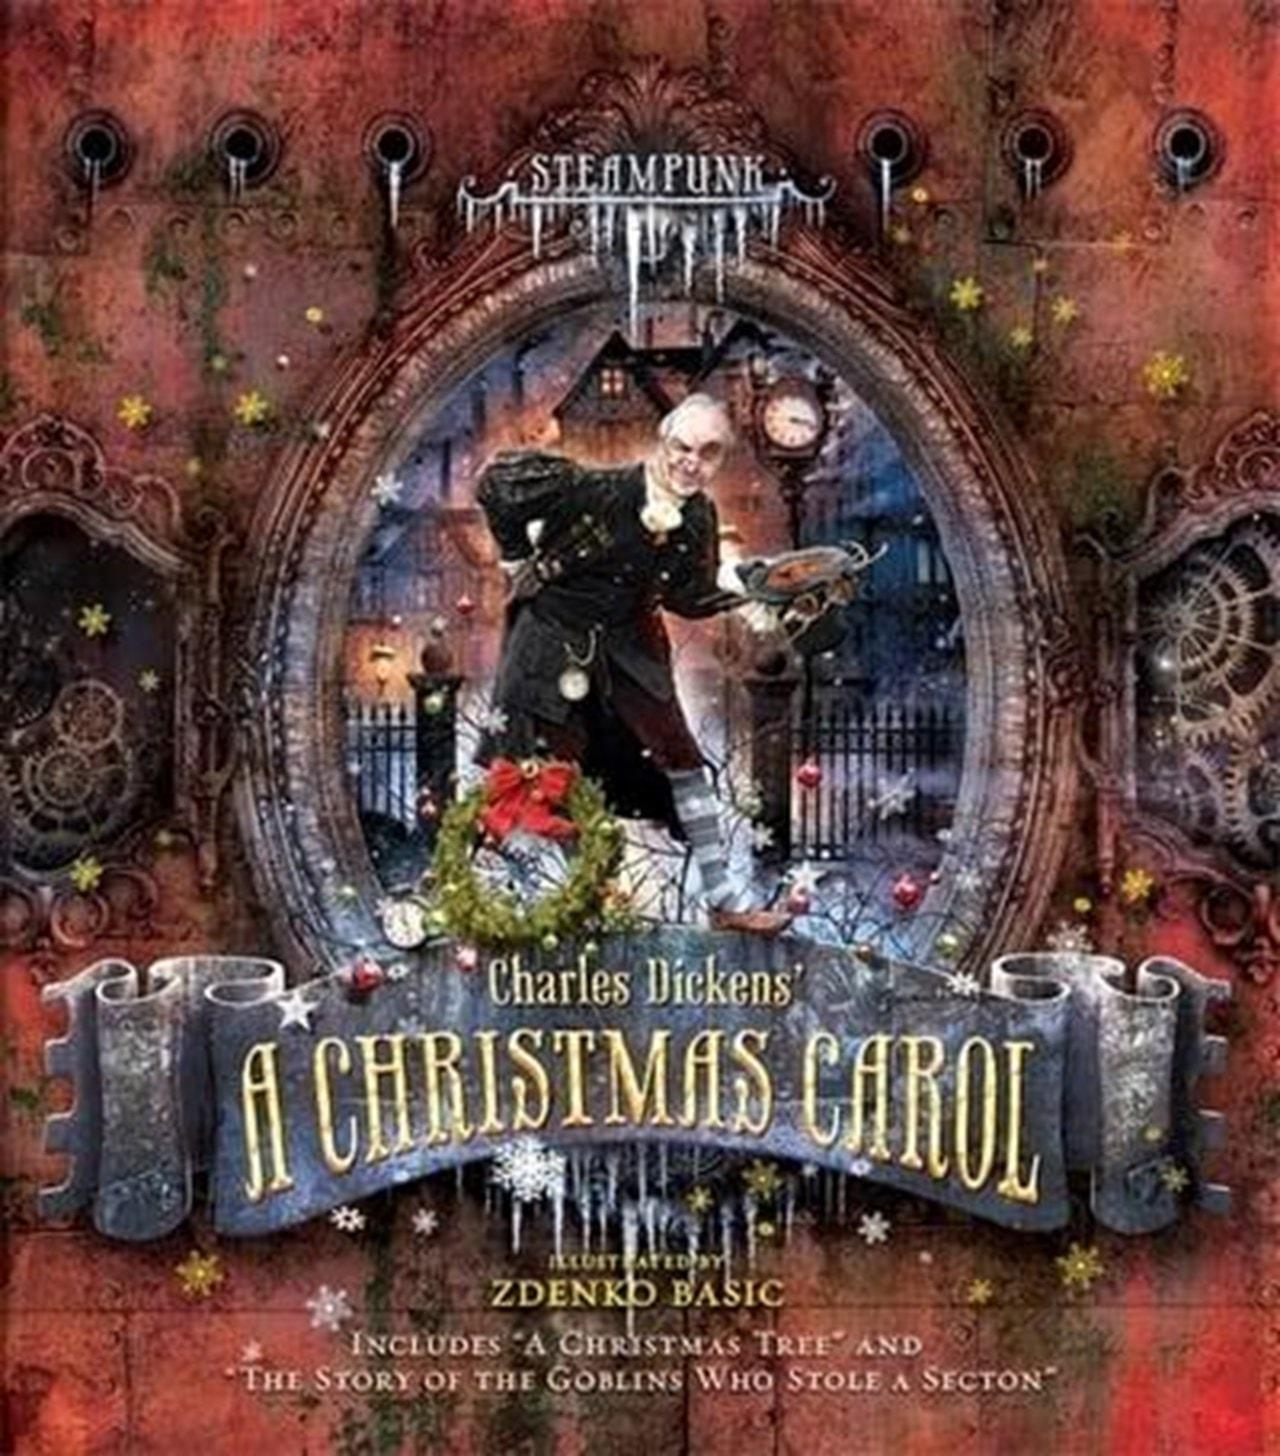 Steampunk: Charles Dickens - A Christmas Carol - 1